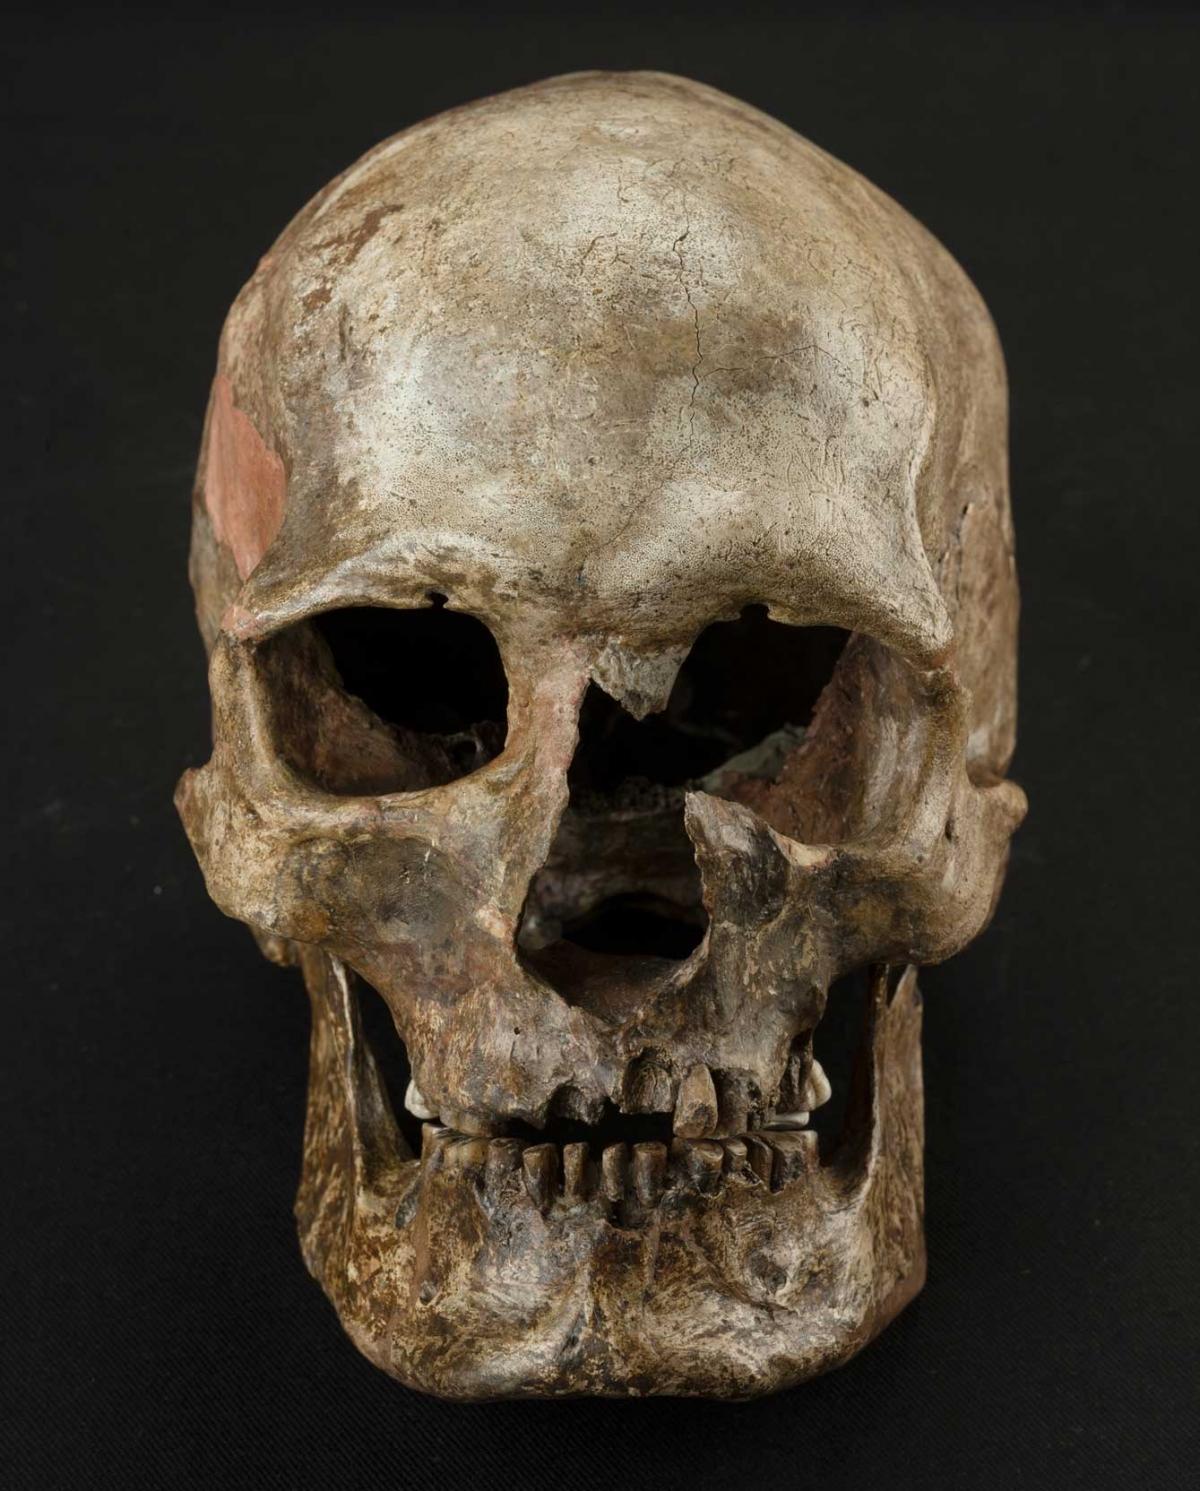 Dolnte Vestonice burial 16, South Moravia, Czech Republic